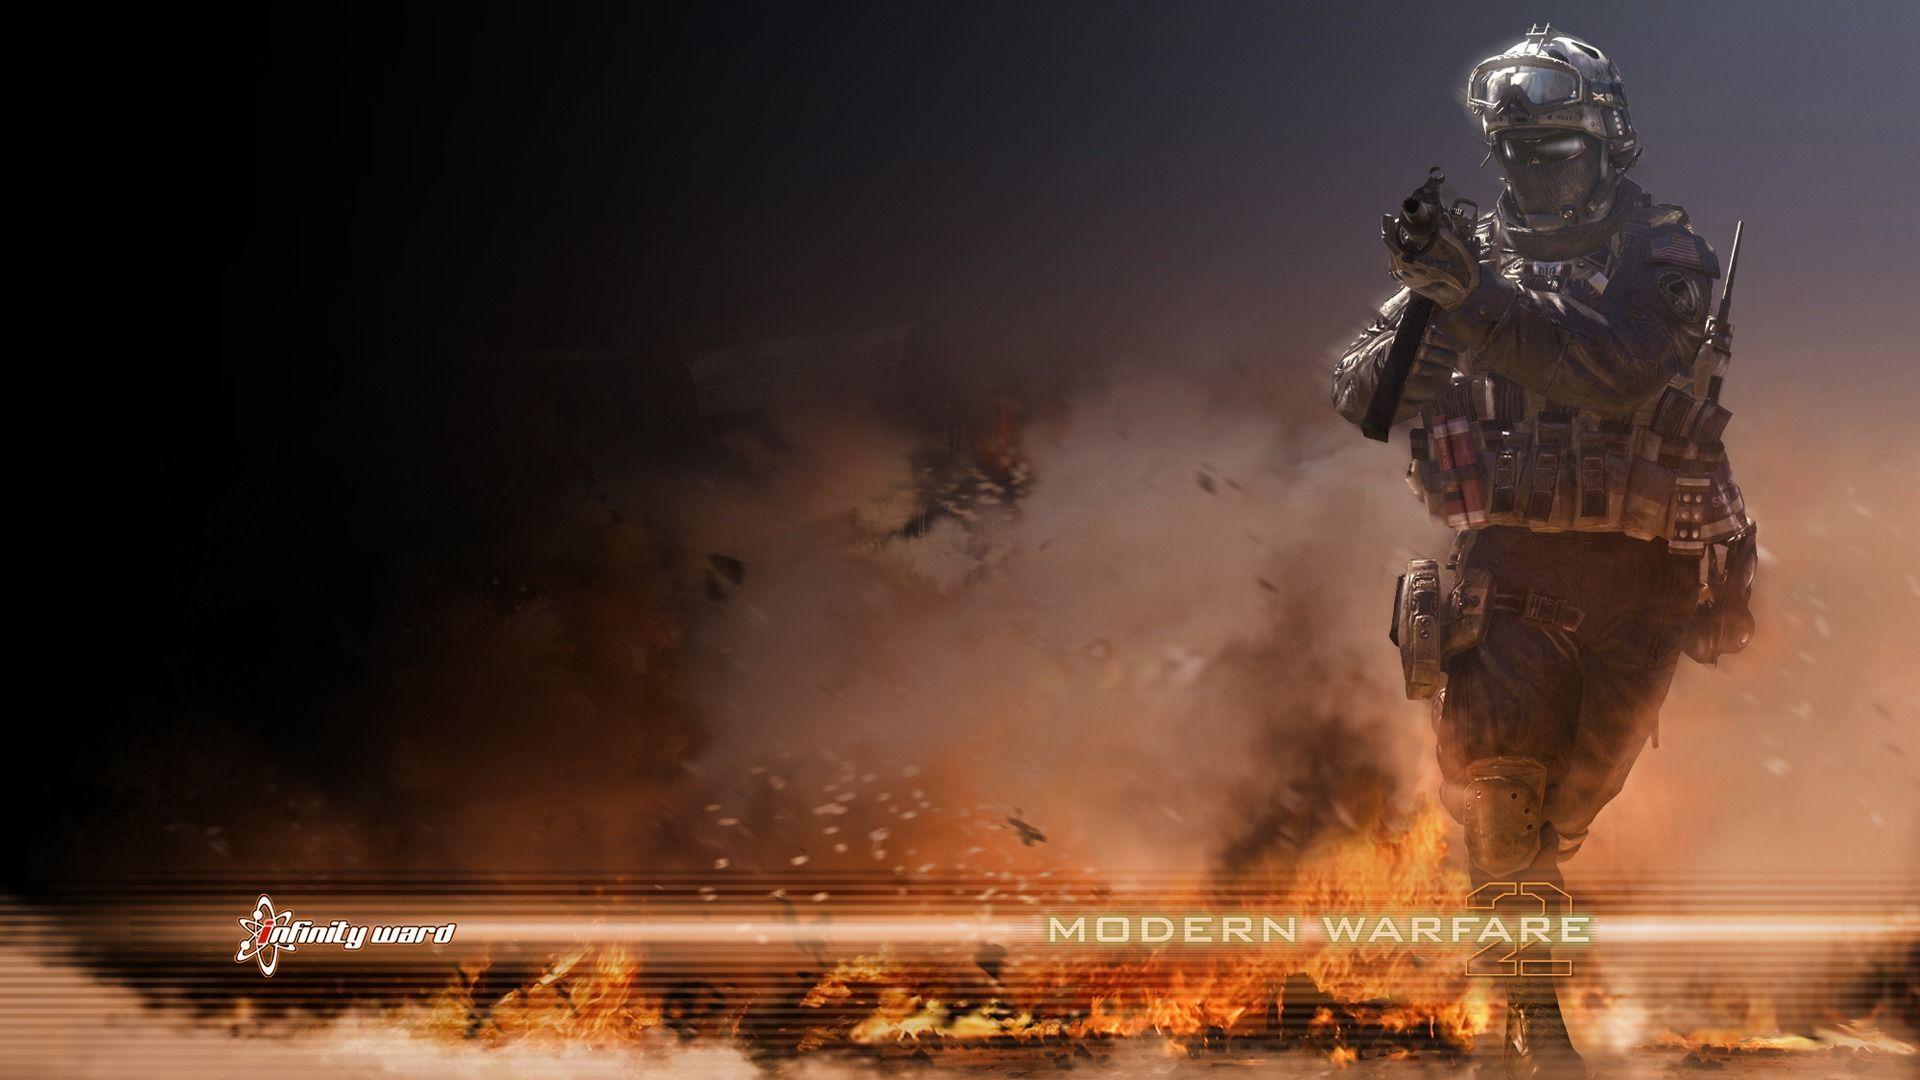 Modern Warfare 2 Wallpapers 1080p Wallpaper Cave